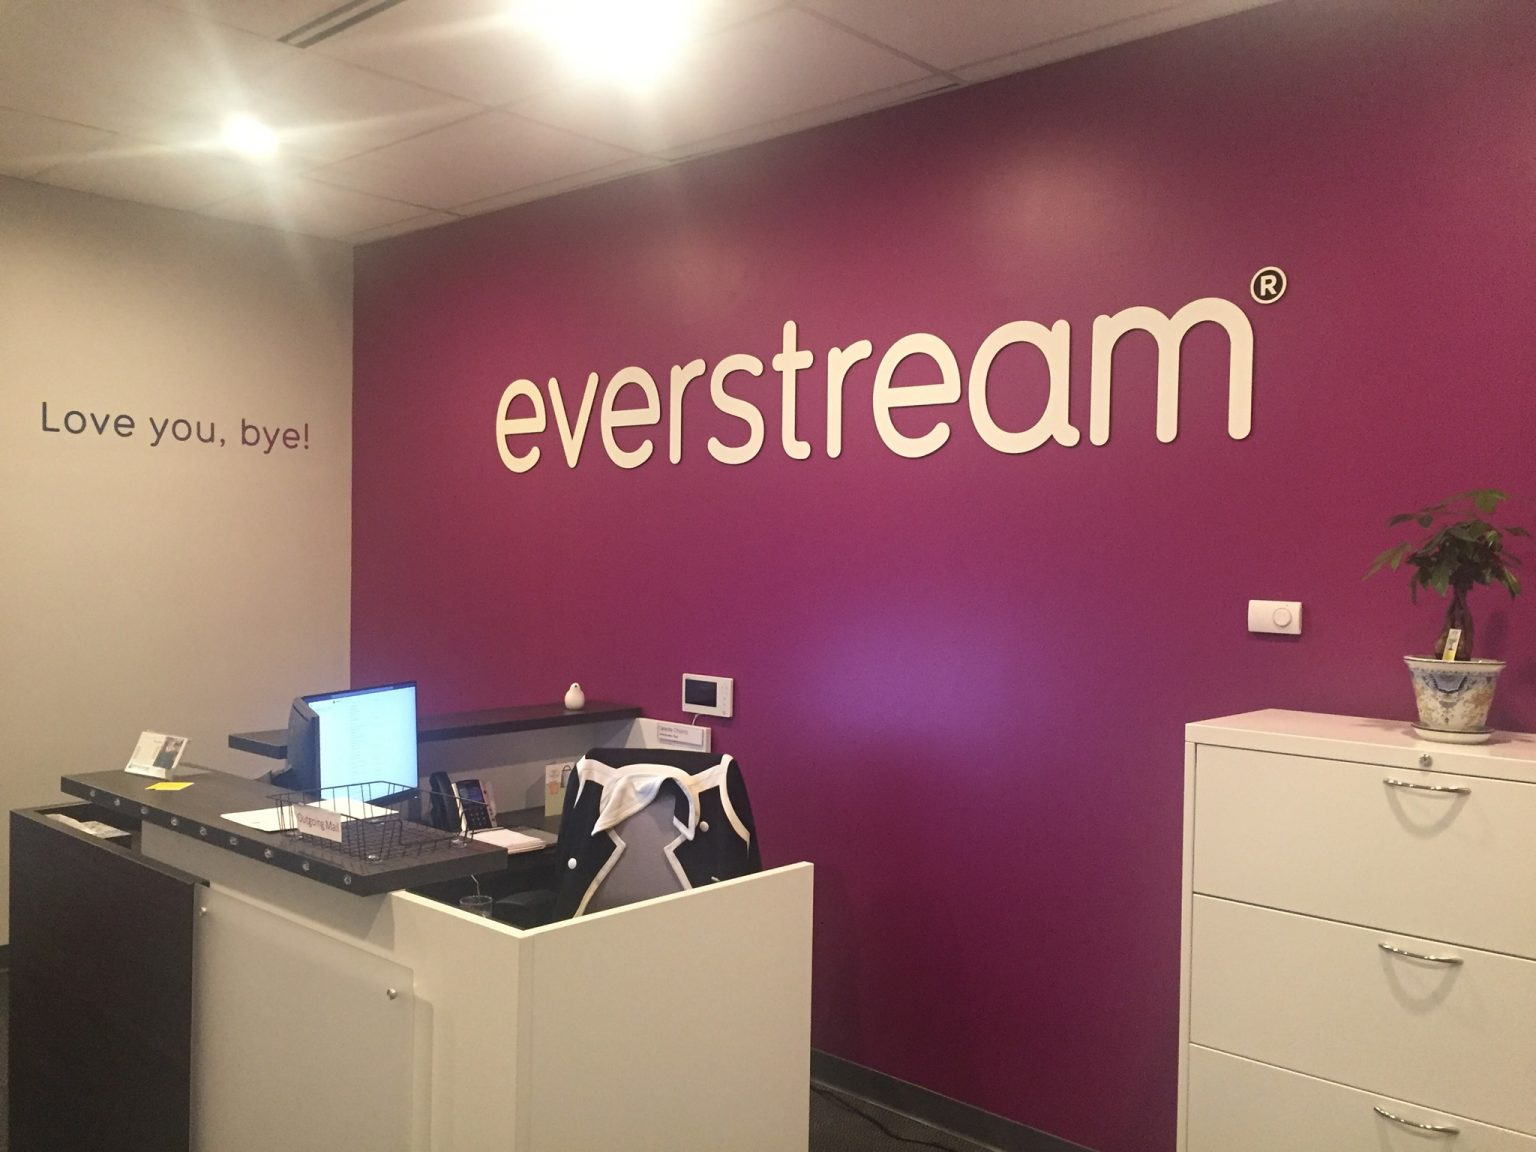 Everstream